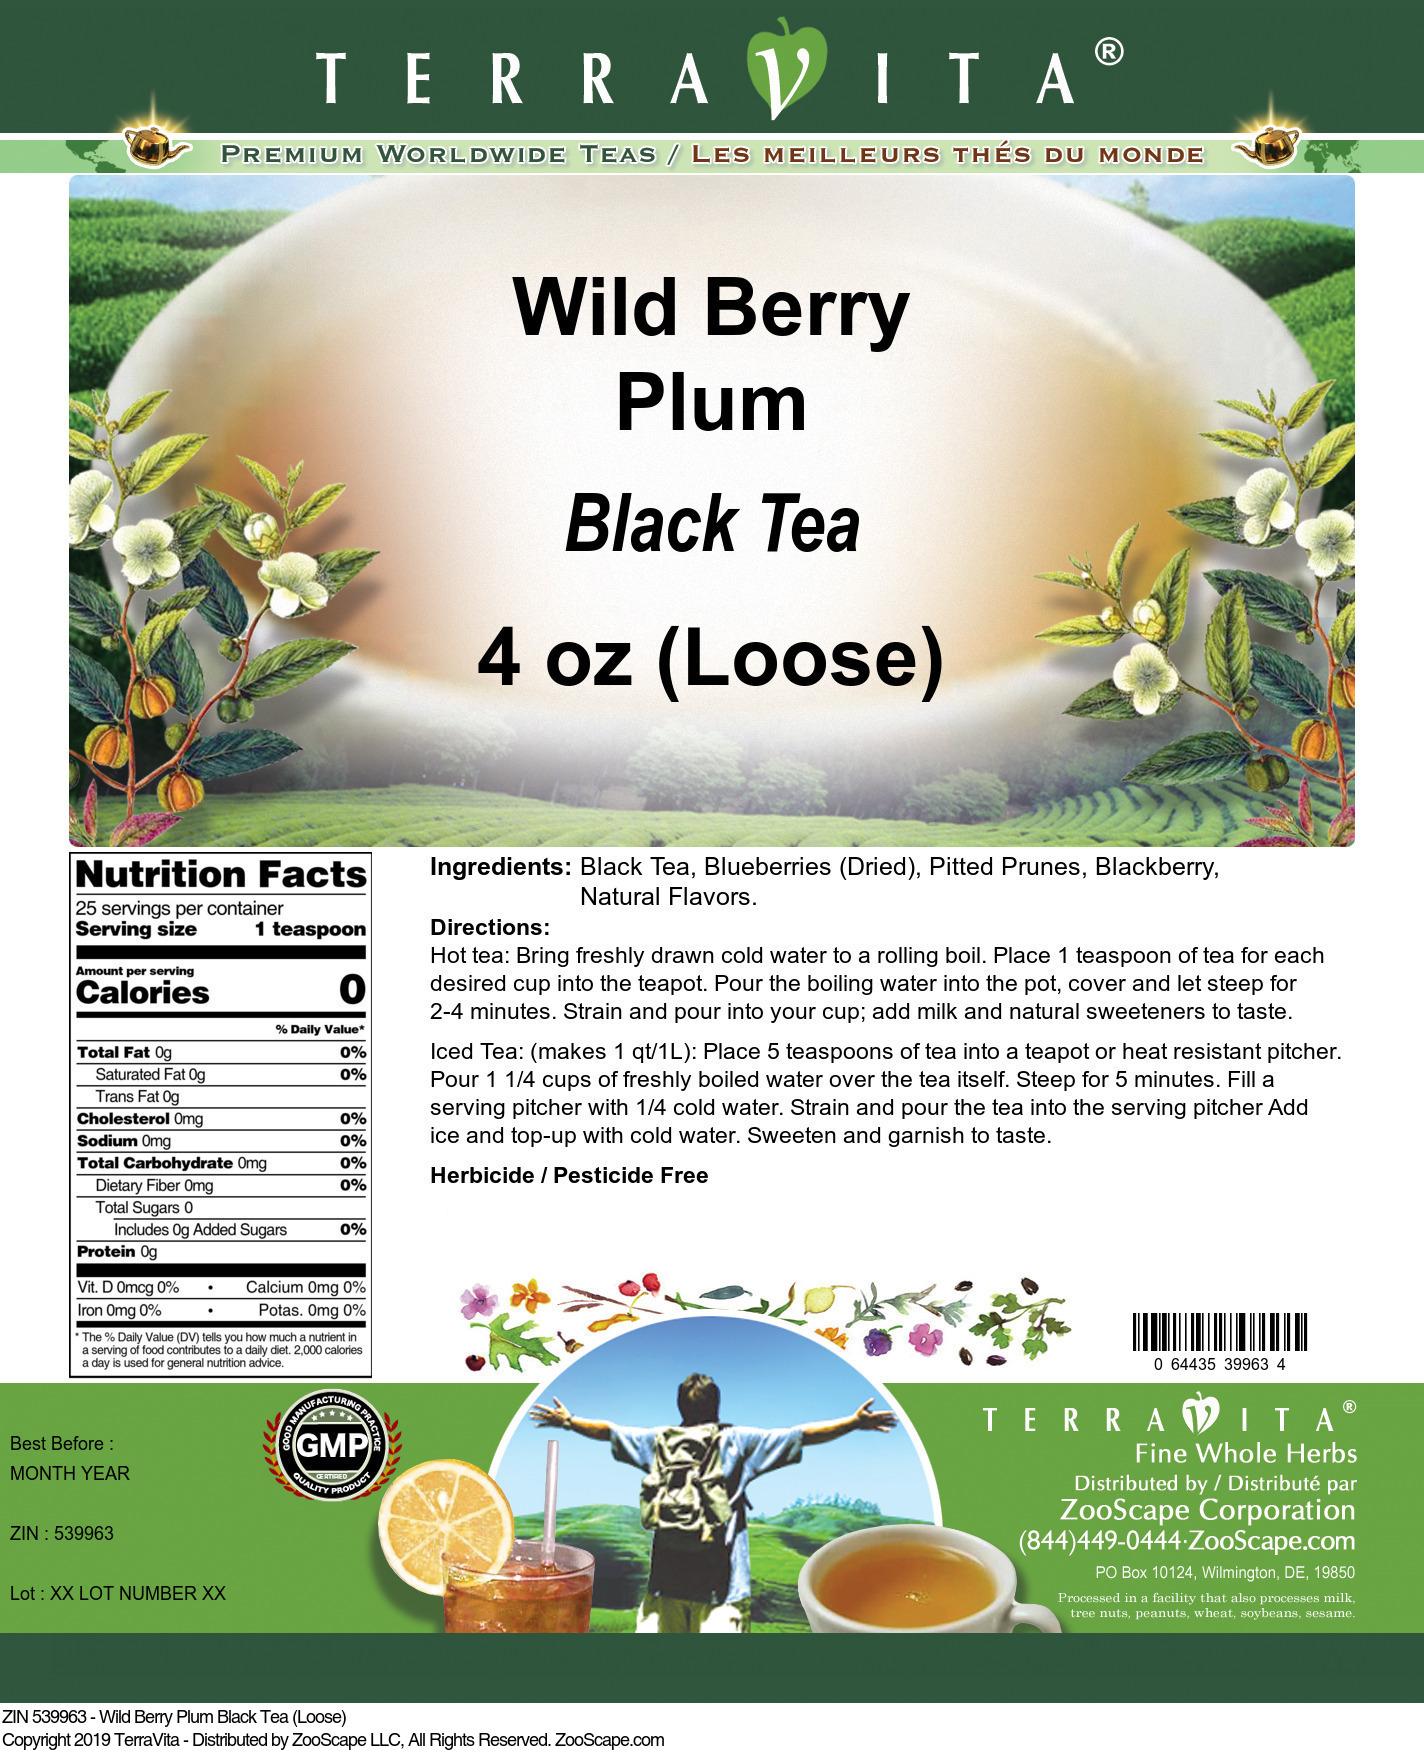 Wild Berry Plum Black Tea (Loose)